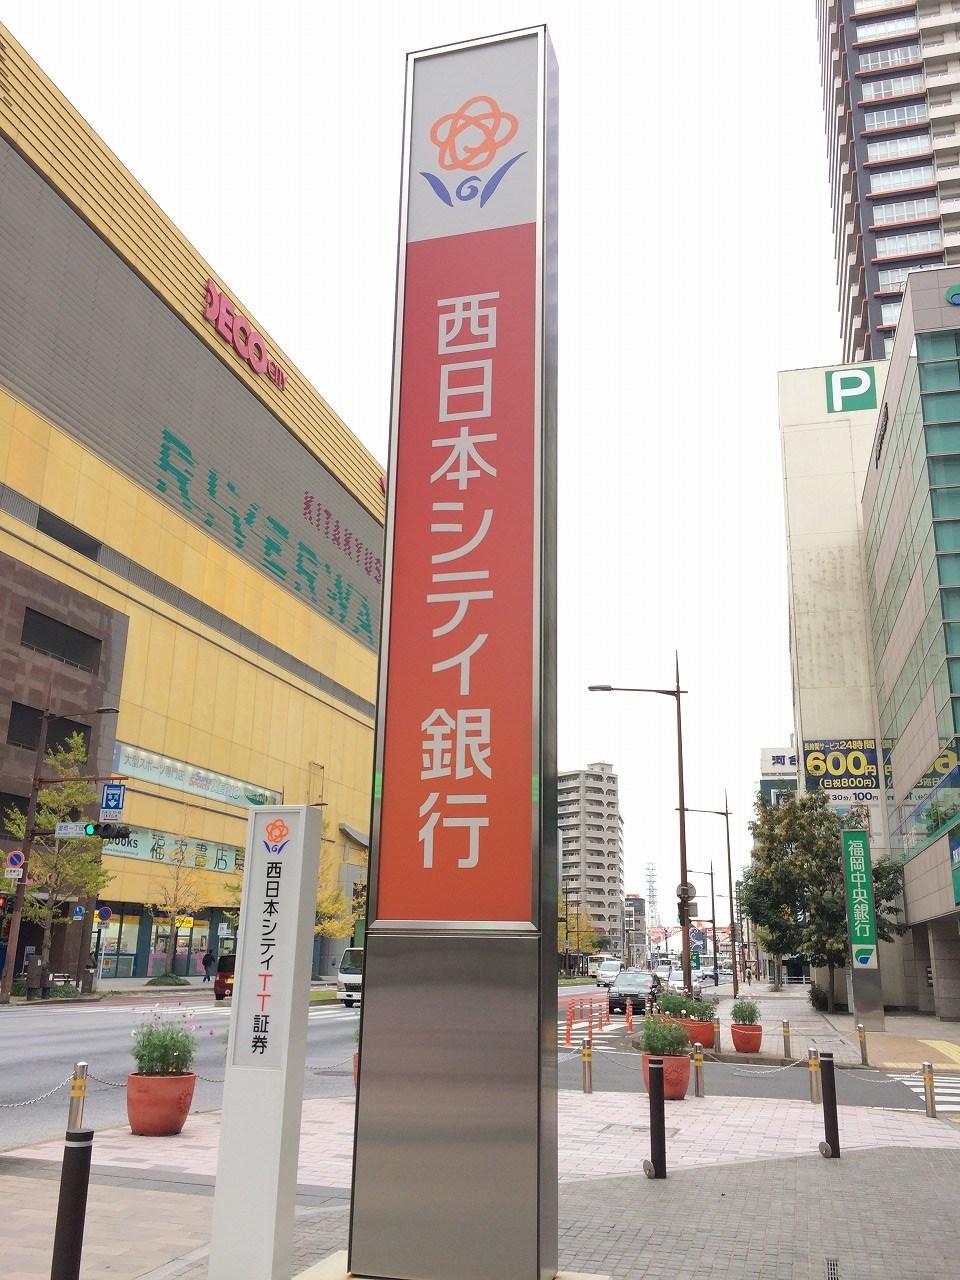 銀行:西日本シティ銀行 黒原 (ATM) 1018m